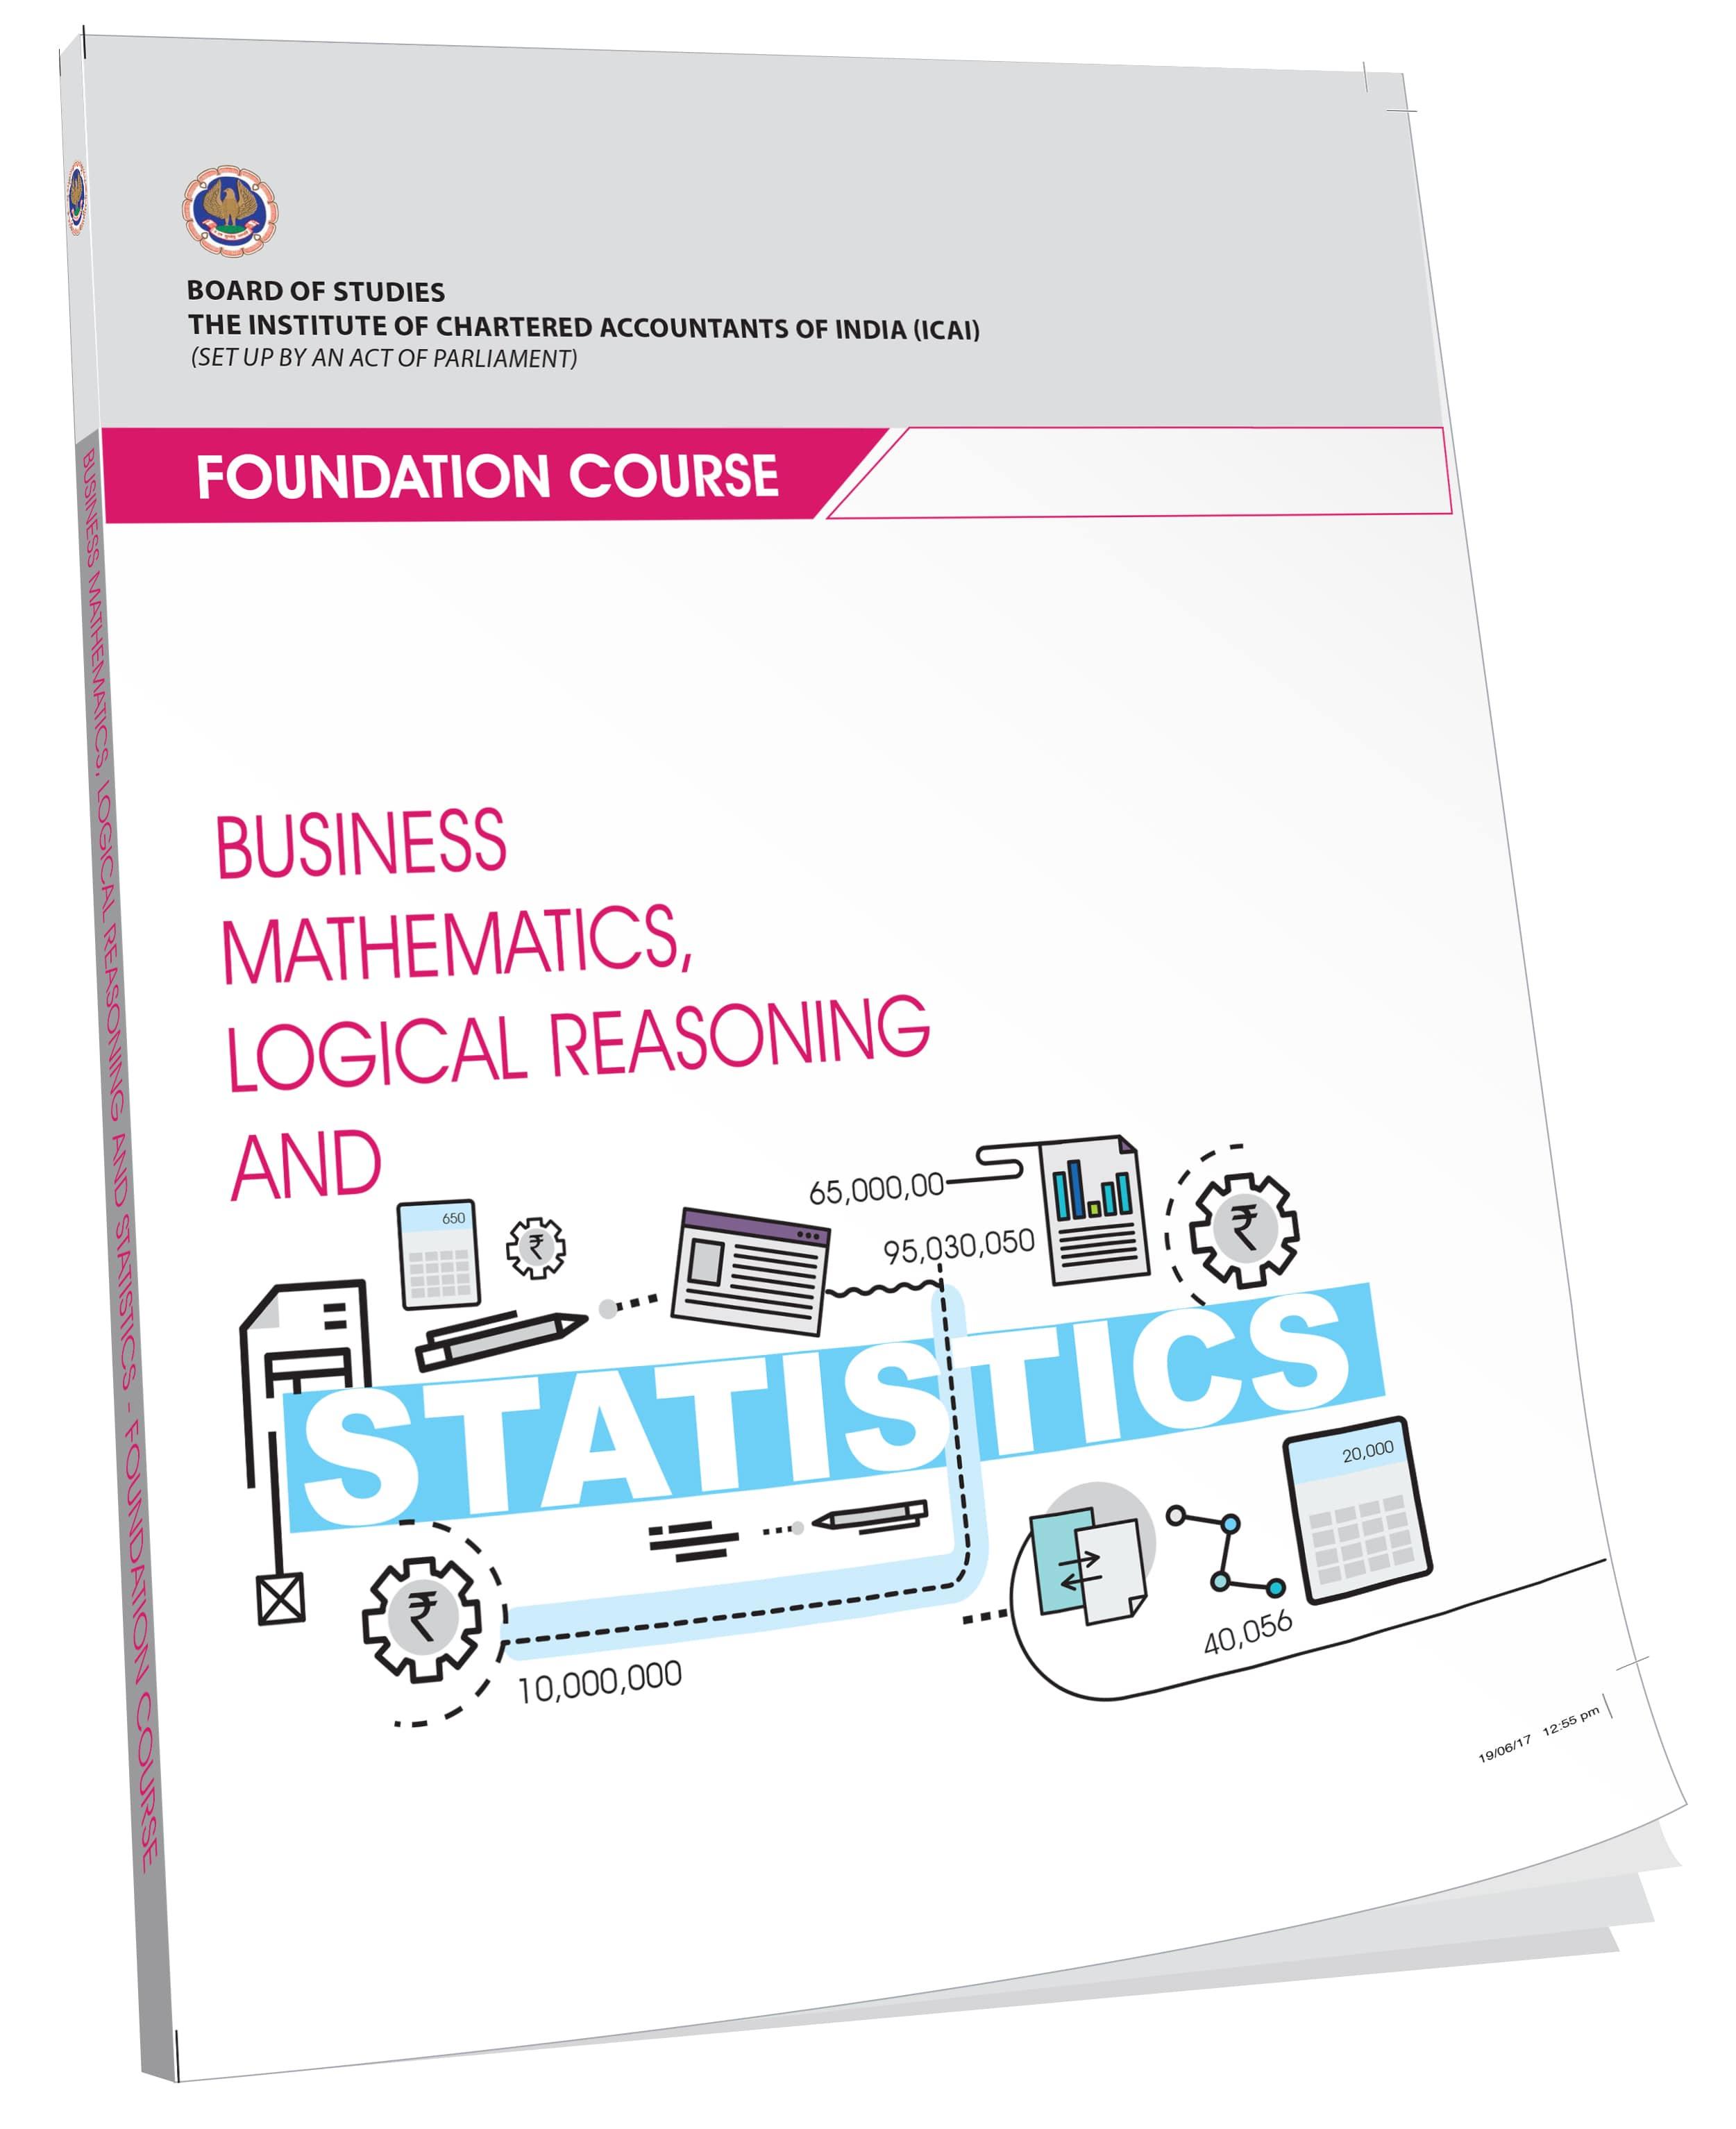 Business Mathematics, Logical Reasoning and Statistics (English), July, 2017